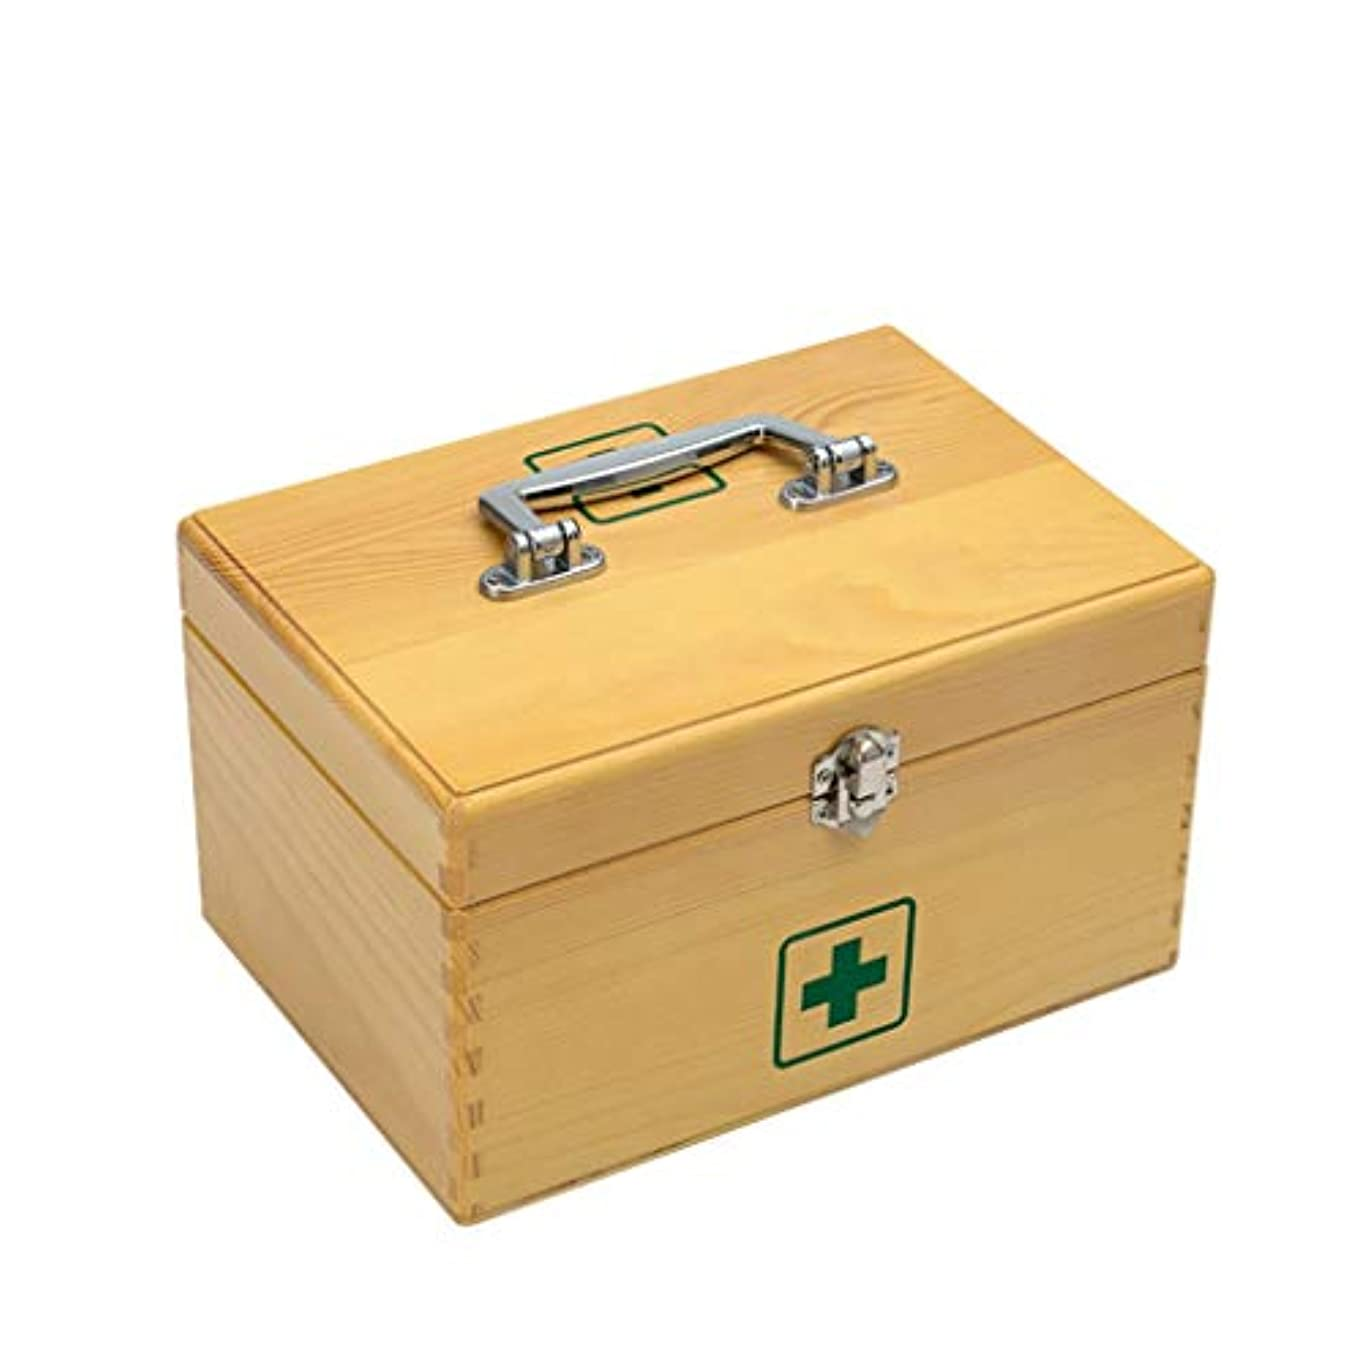 所持工業化する人種木製家庭用薬箱救急箱医療箱薬収納家庭用子供小さな薬箱外来ポータブル 薬箱 (Size : 28×20×13cm)